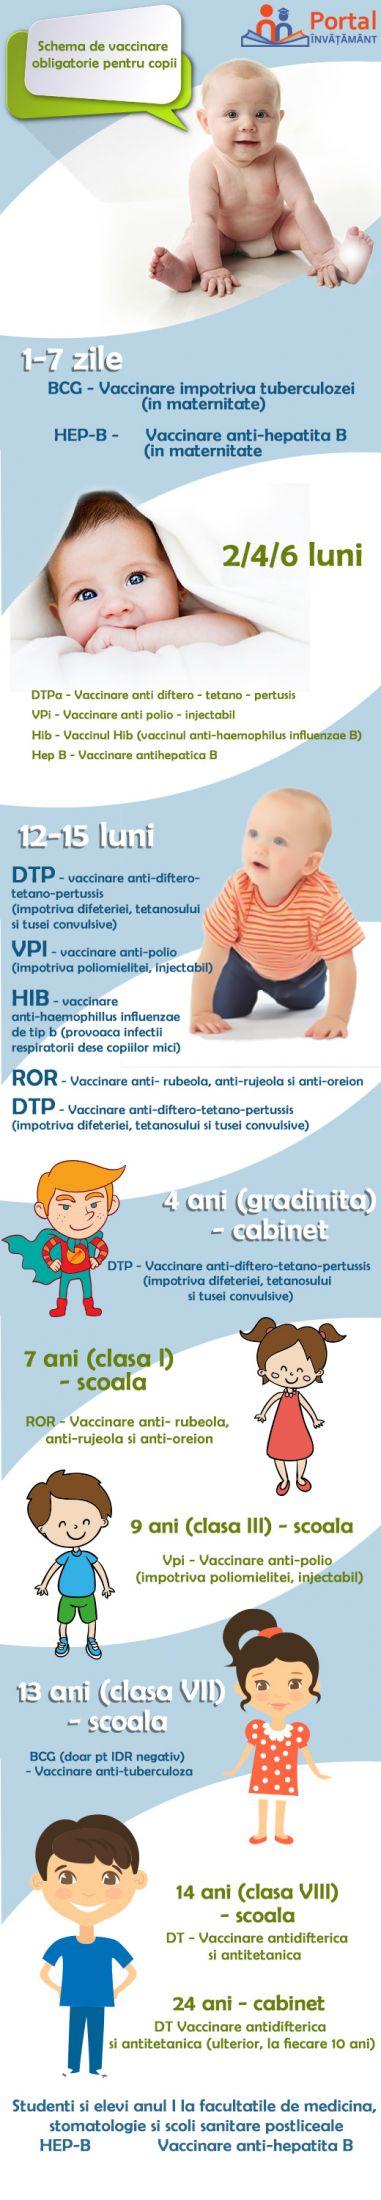 Schema obligatorie de vaccinare pentru copii